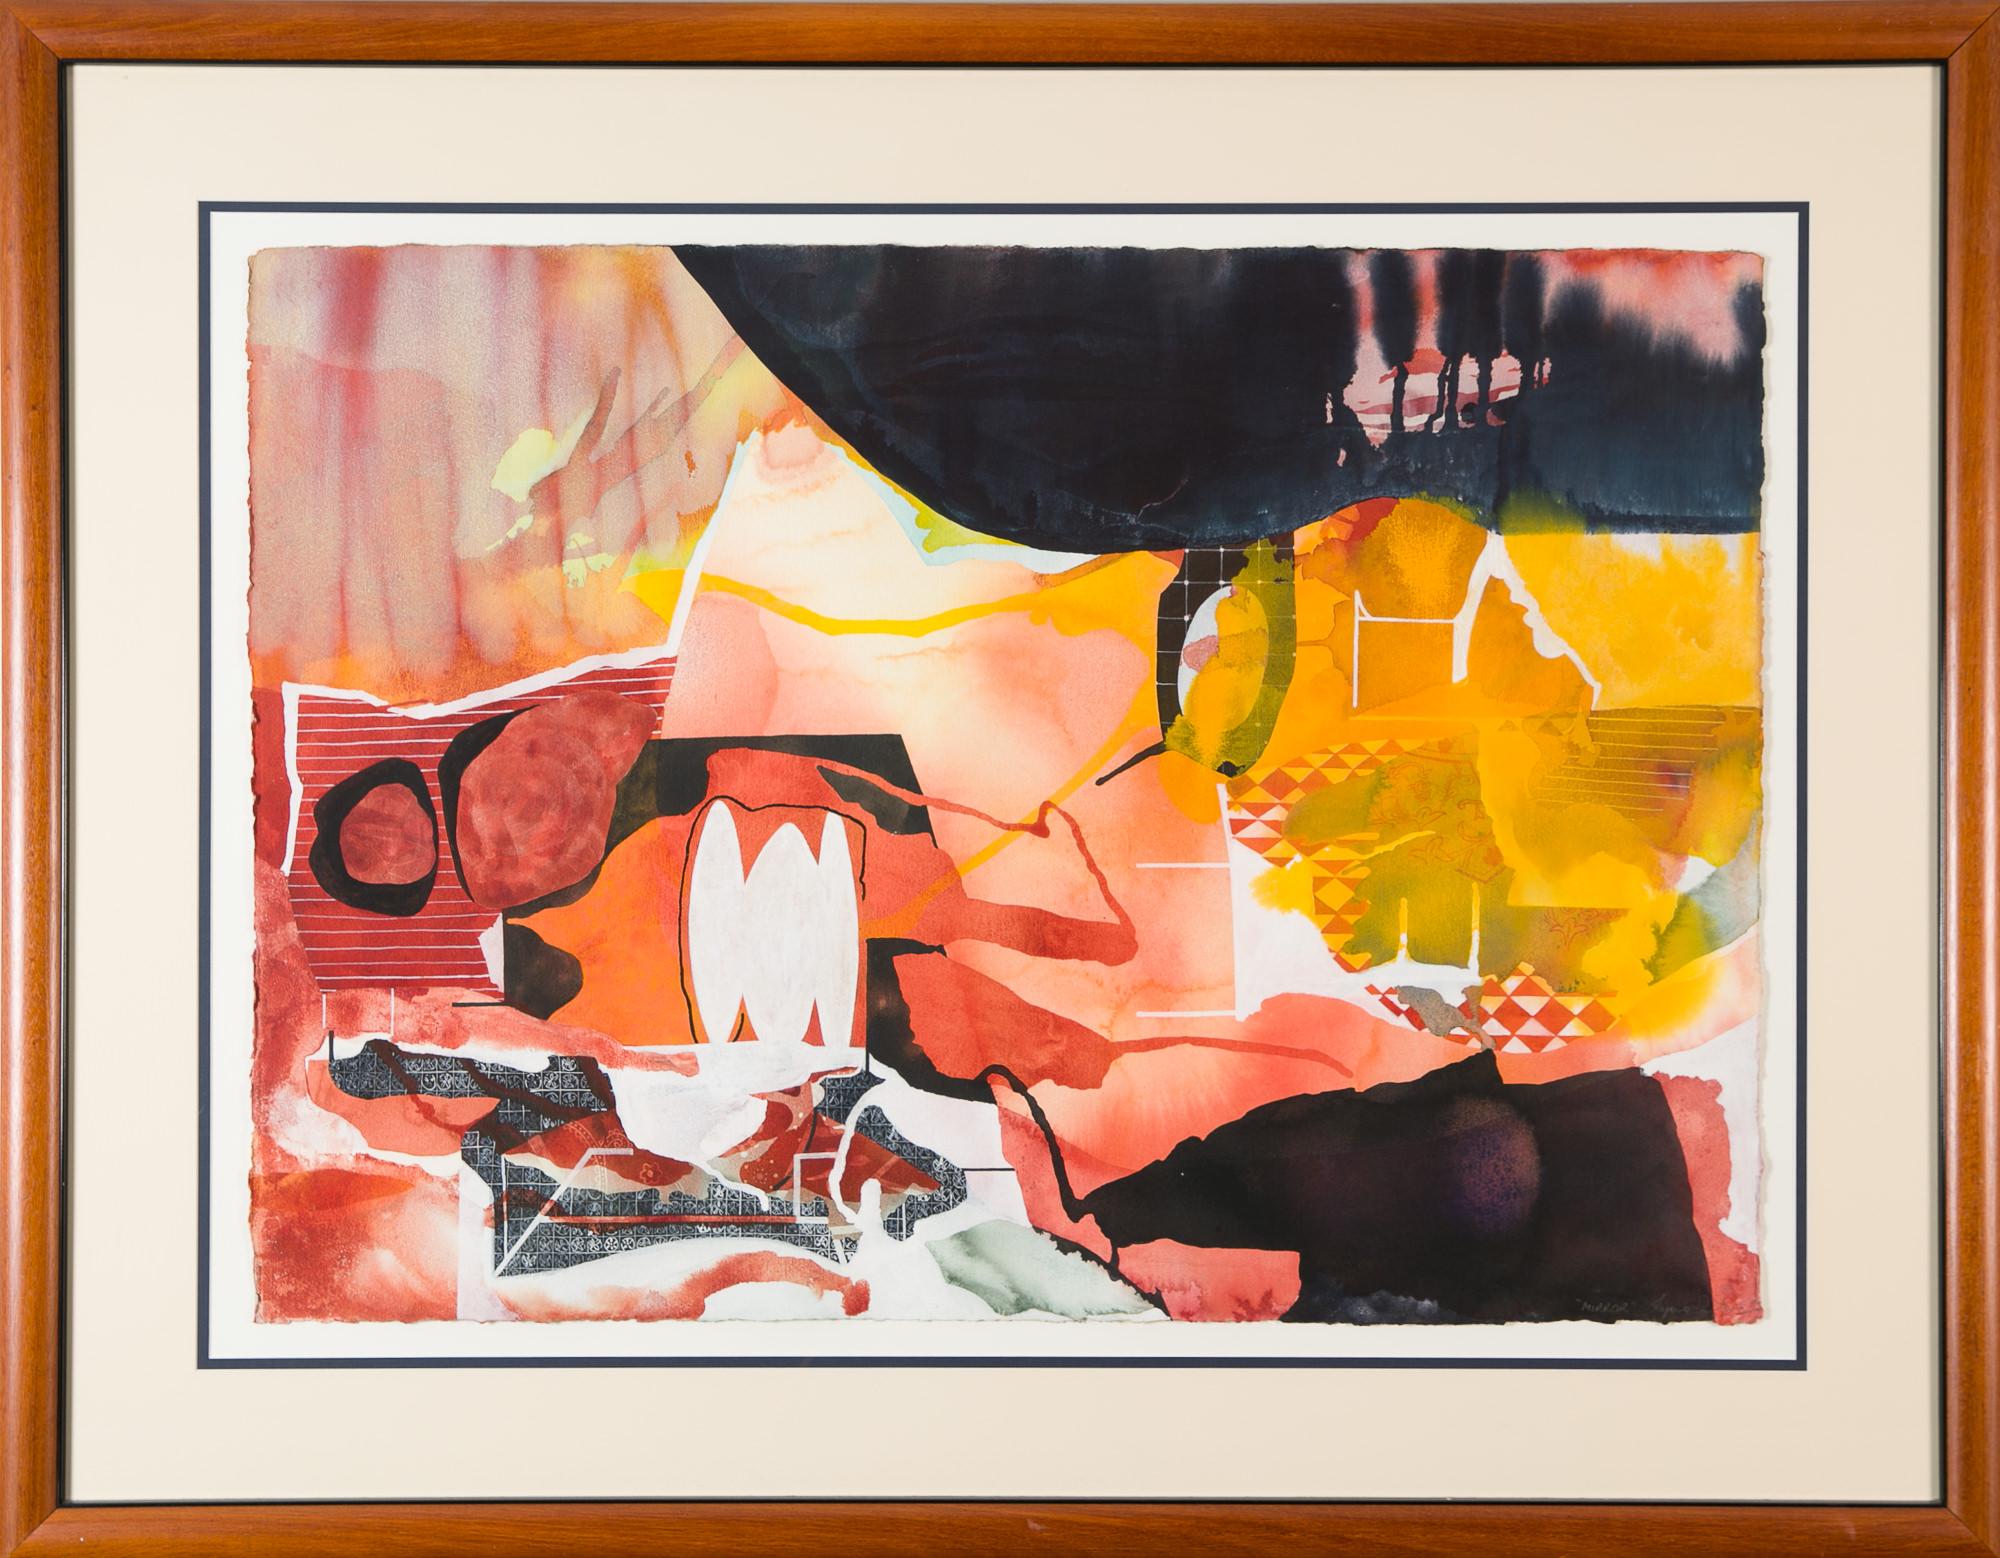 'Lynne Eastaway (1949 -) Mirror 1994, Mixed Media on Paper'